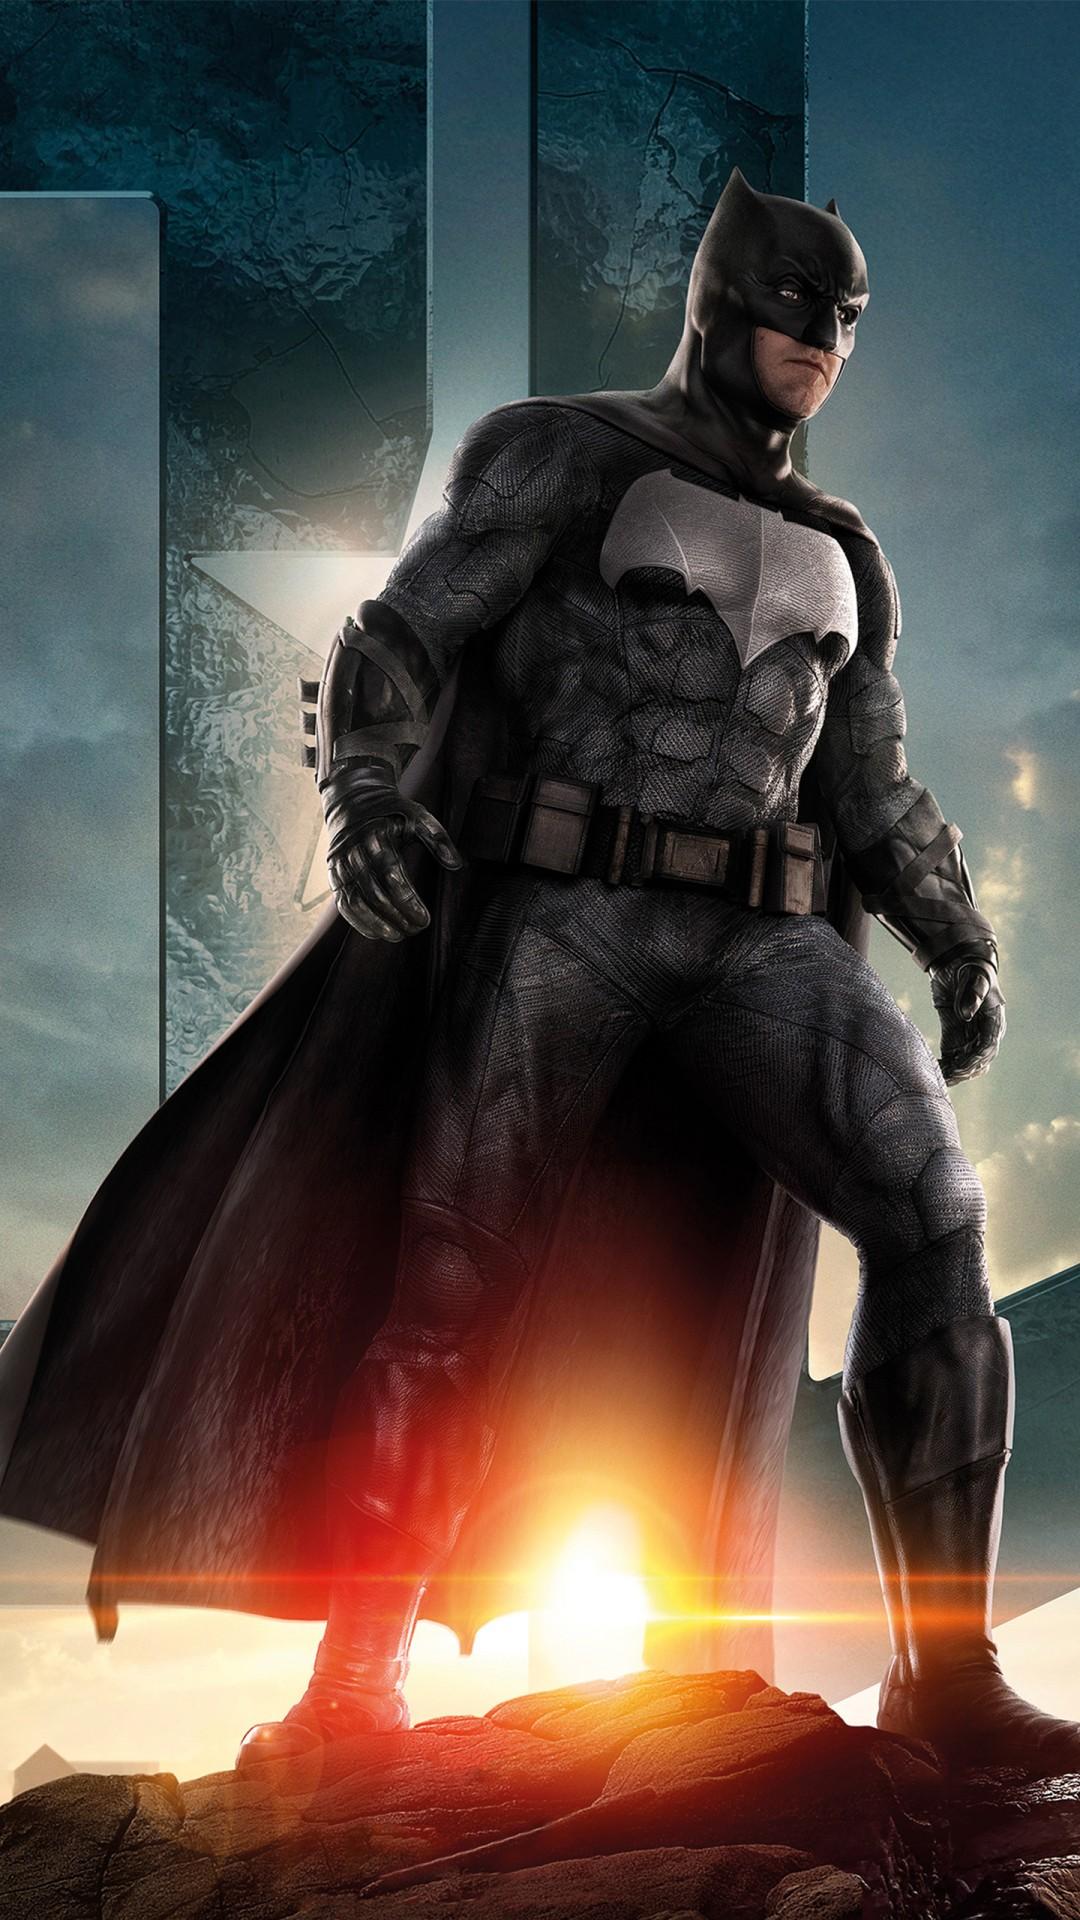 Batman Iphone 7 Wallpaper Batman In Justice League Wallpapers Hd Wallpapers Id